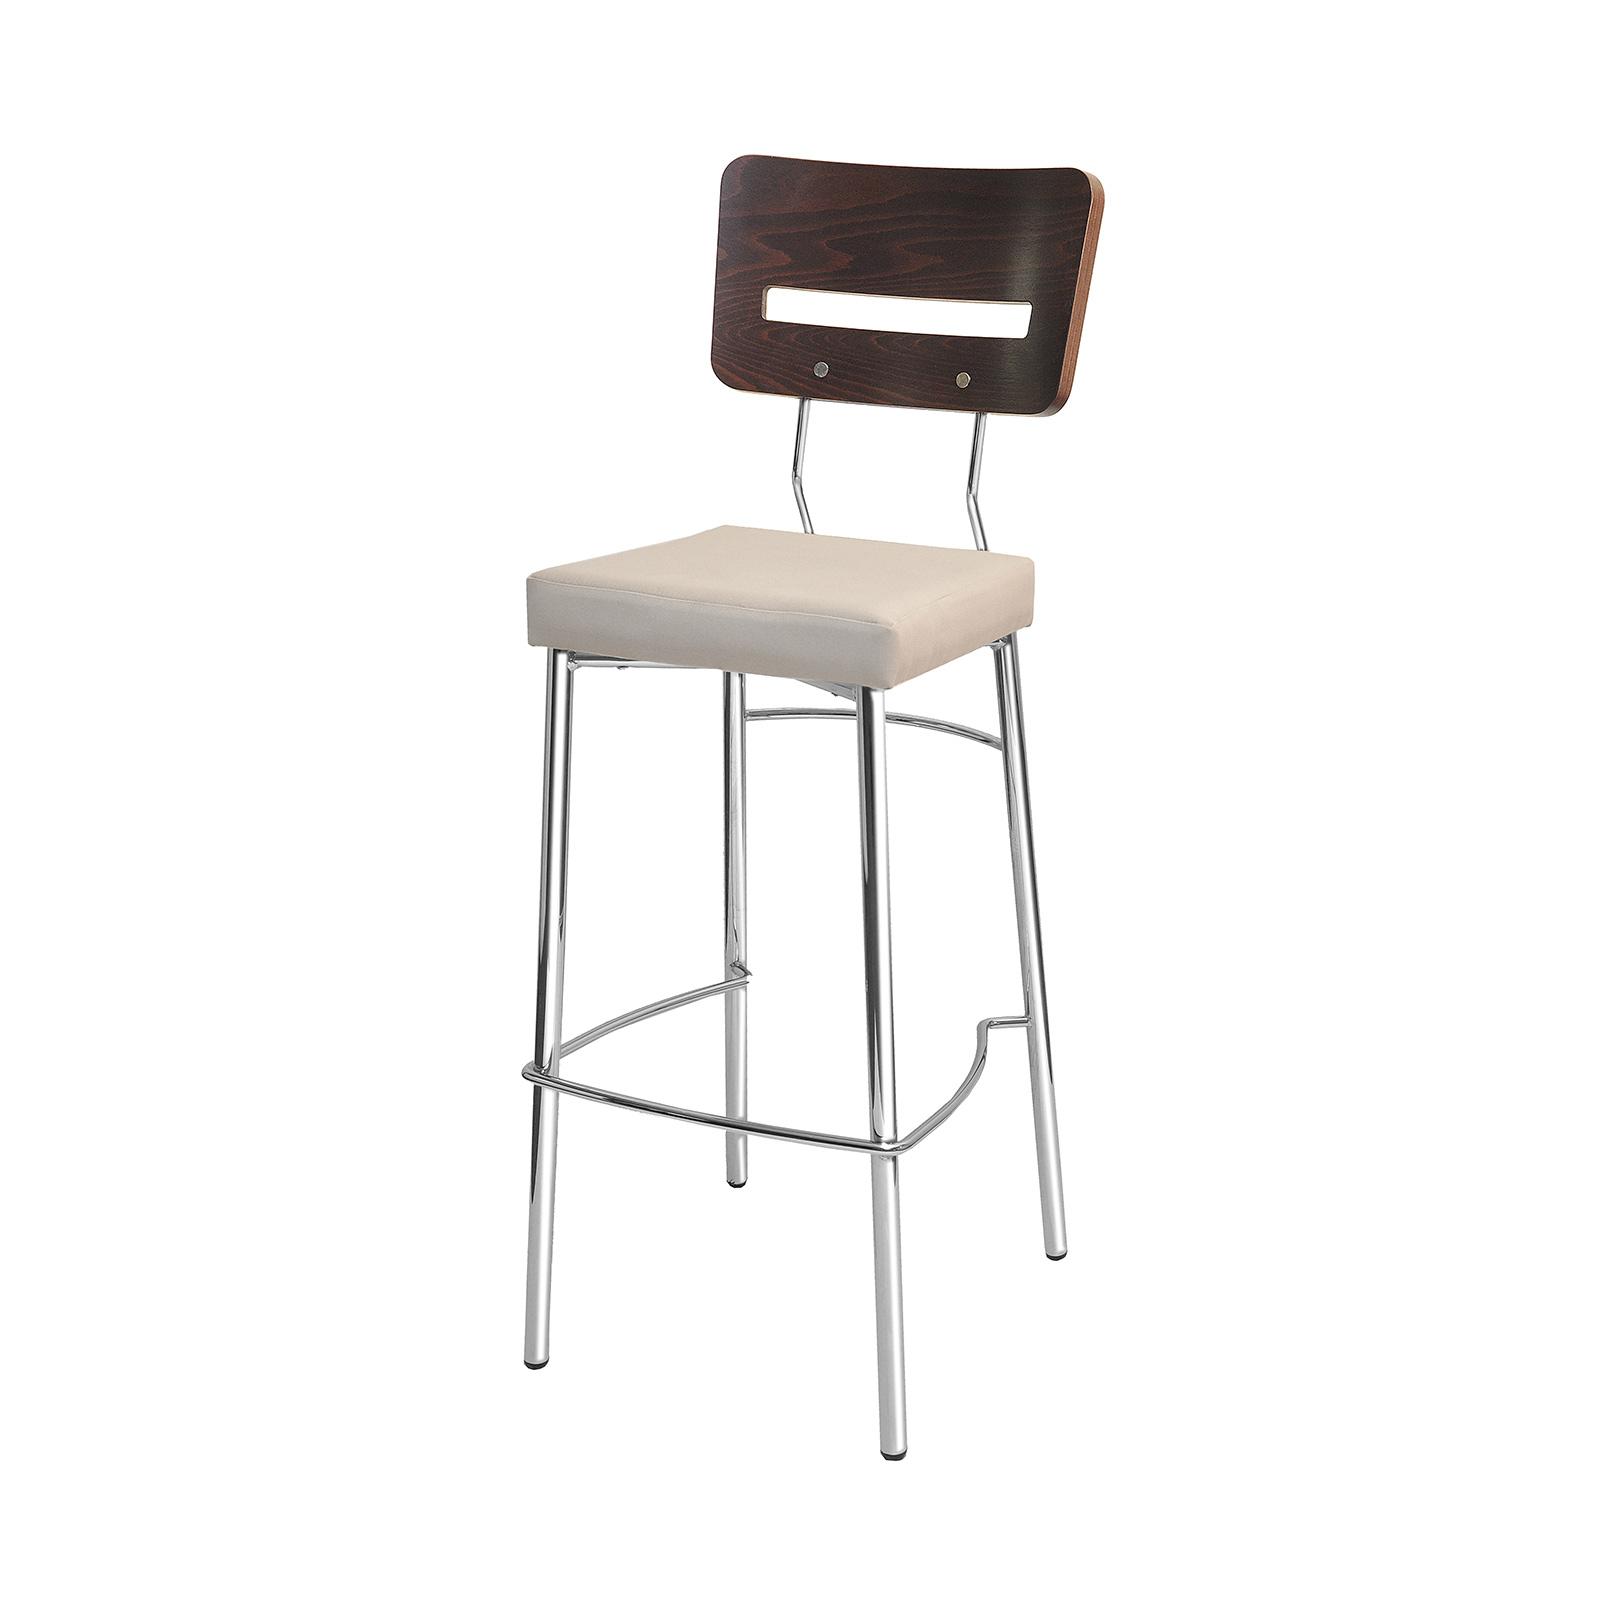 Florida Seating CN-MADISON B GR5 bar stool, indoor